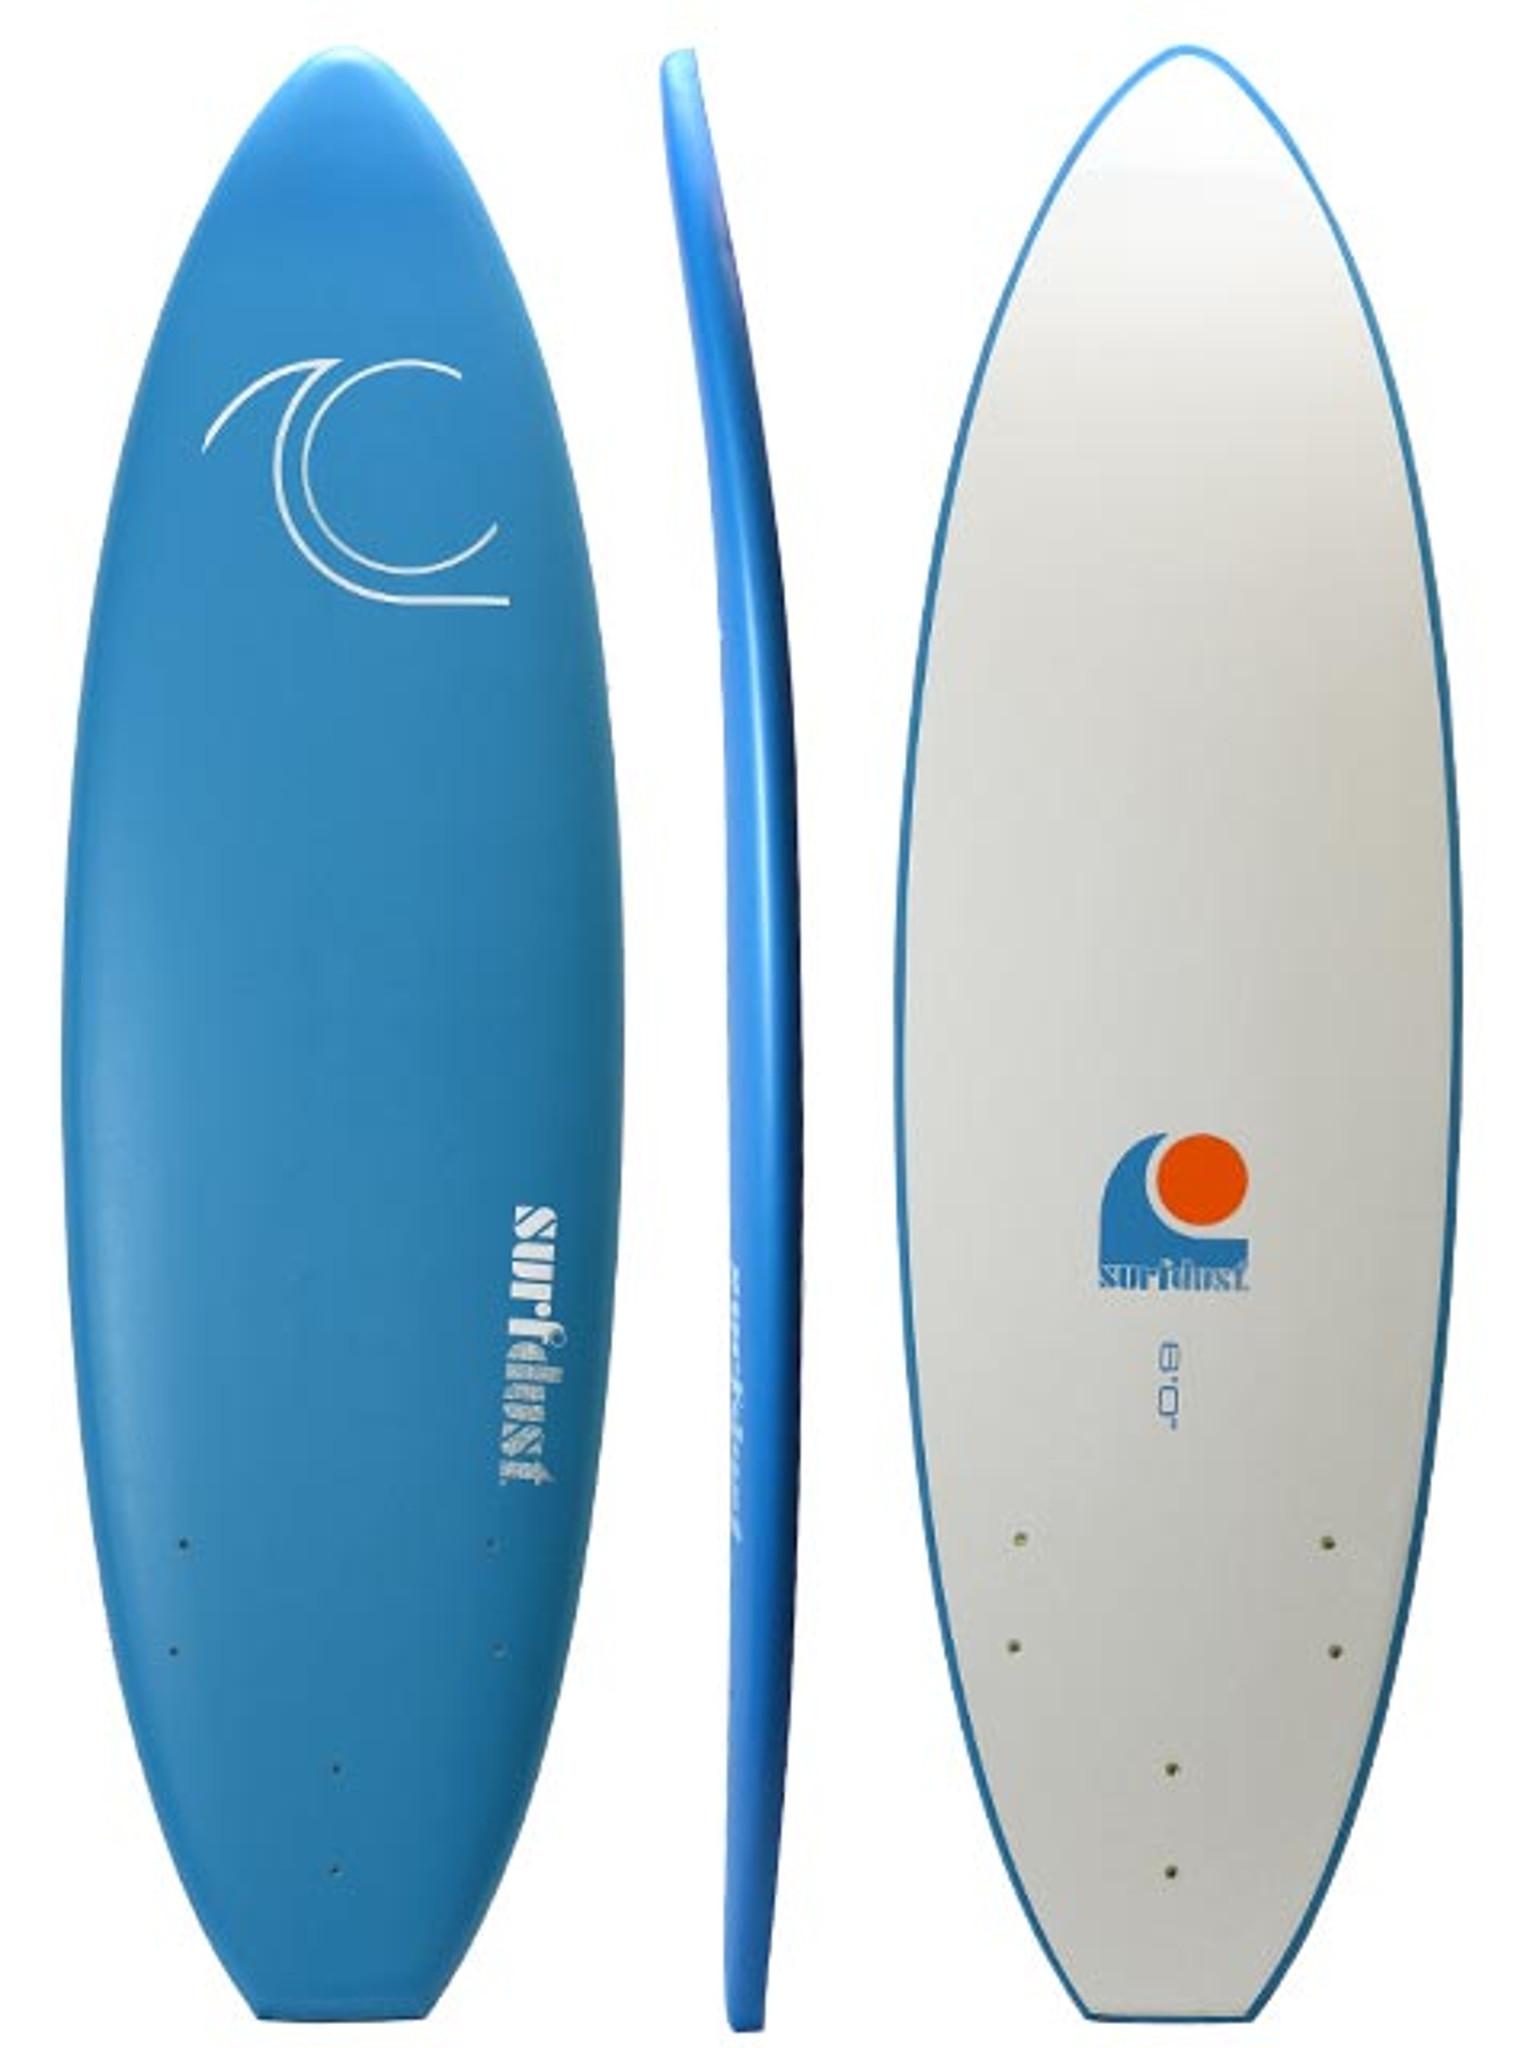 SURFDUST - Intro 6ft Soft Surfboard - Beginners Surfing